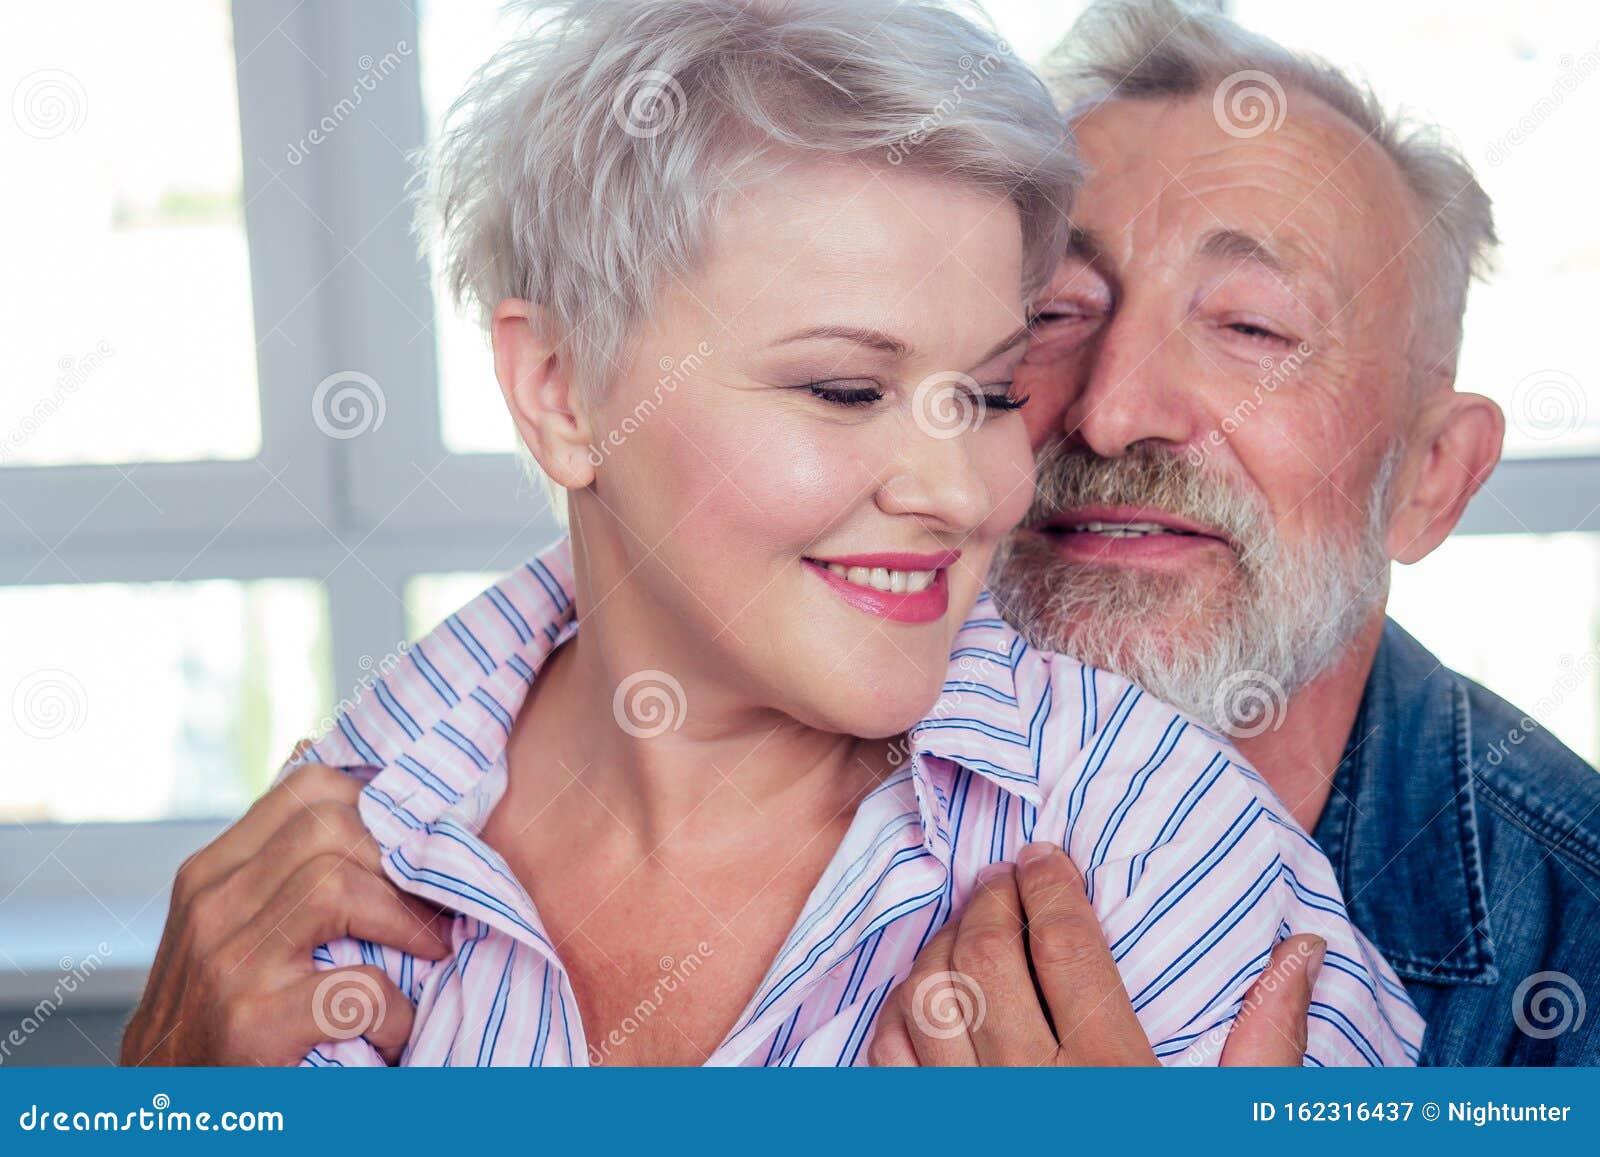 Adult singles dating randolph maine